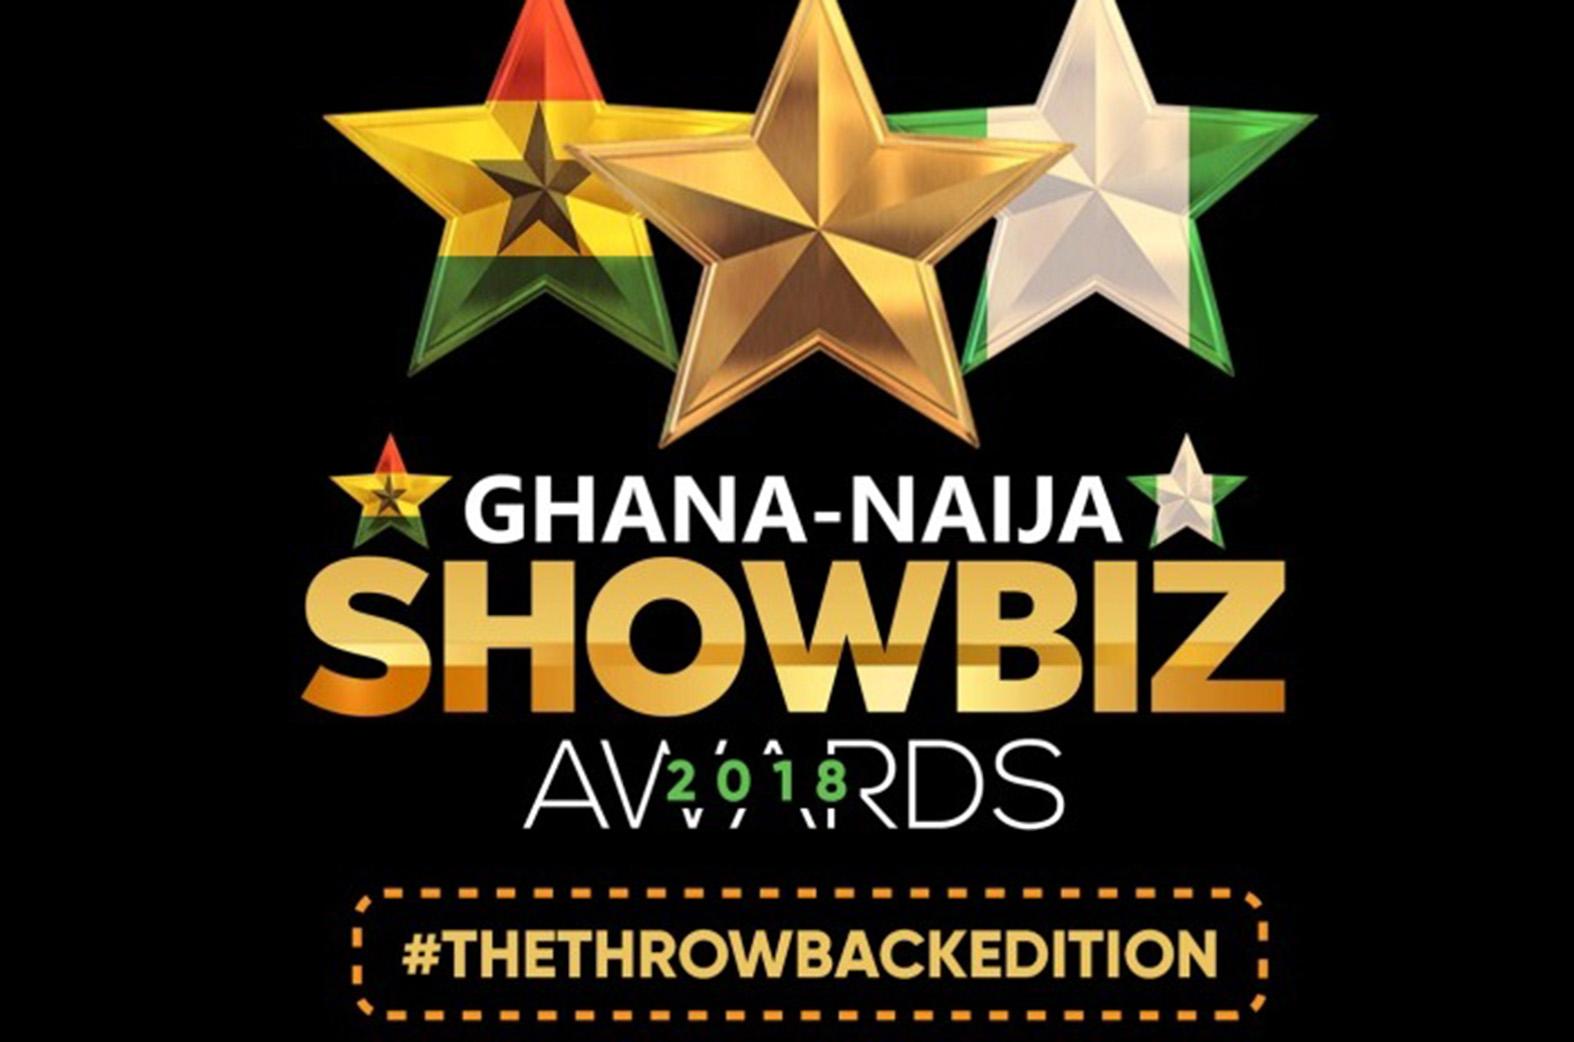 Ghana Naija Showbiz Awards nominees announcement on 25th September